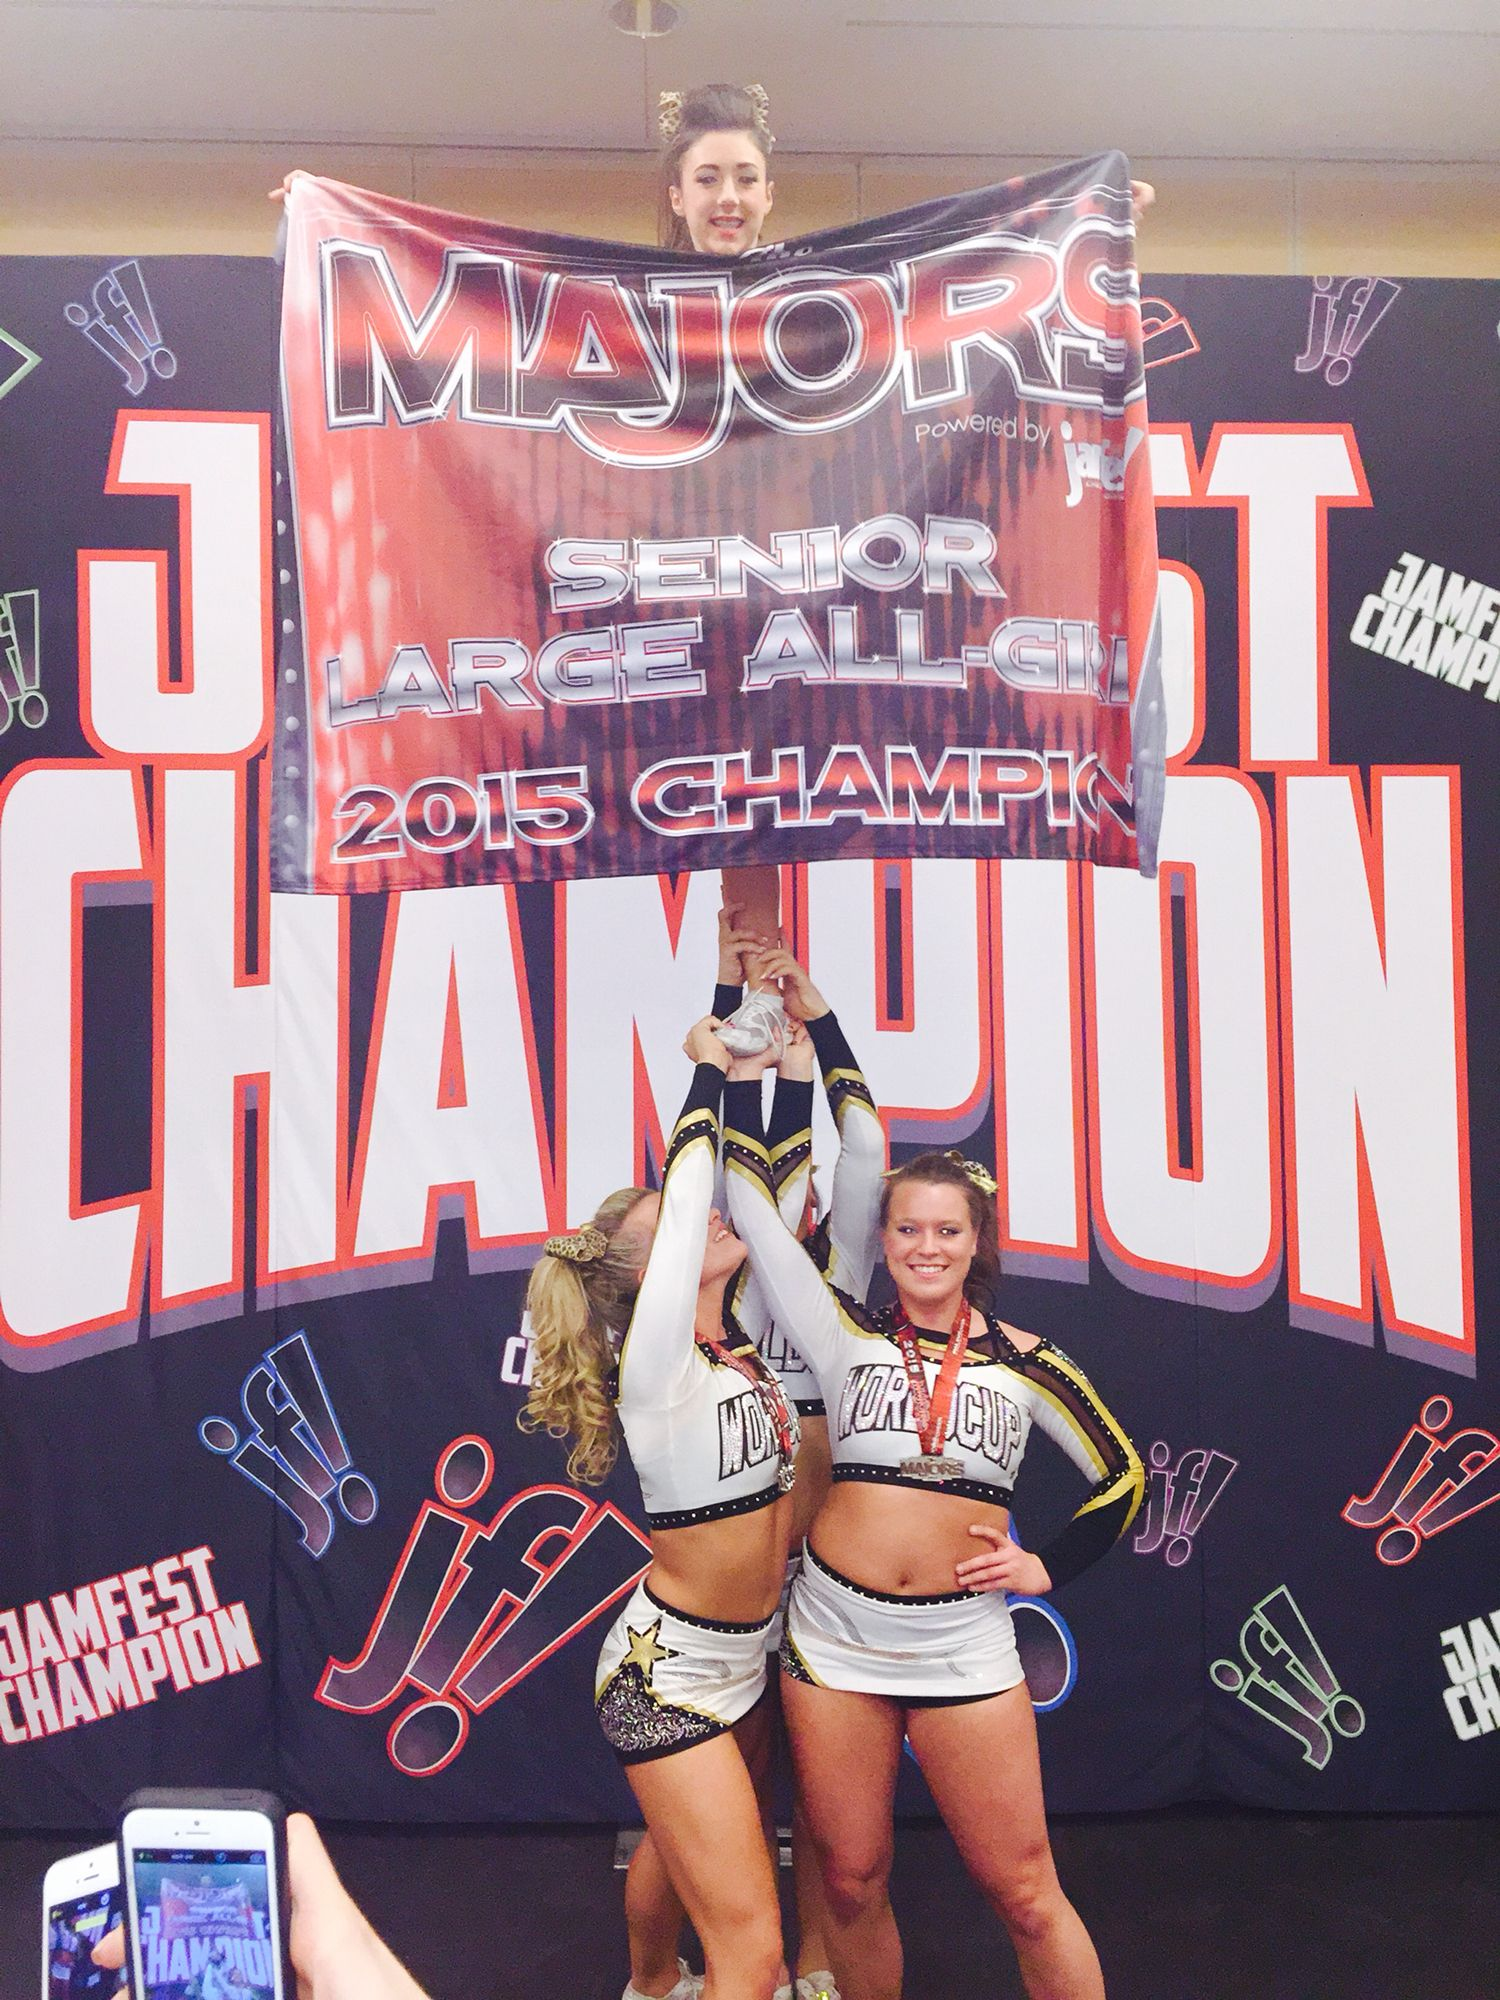 WCSS The Majors Cheer award, Allstar cheerleading, Cheer